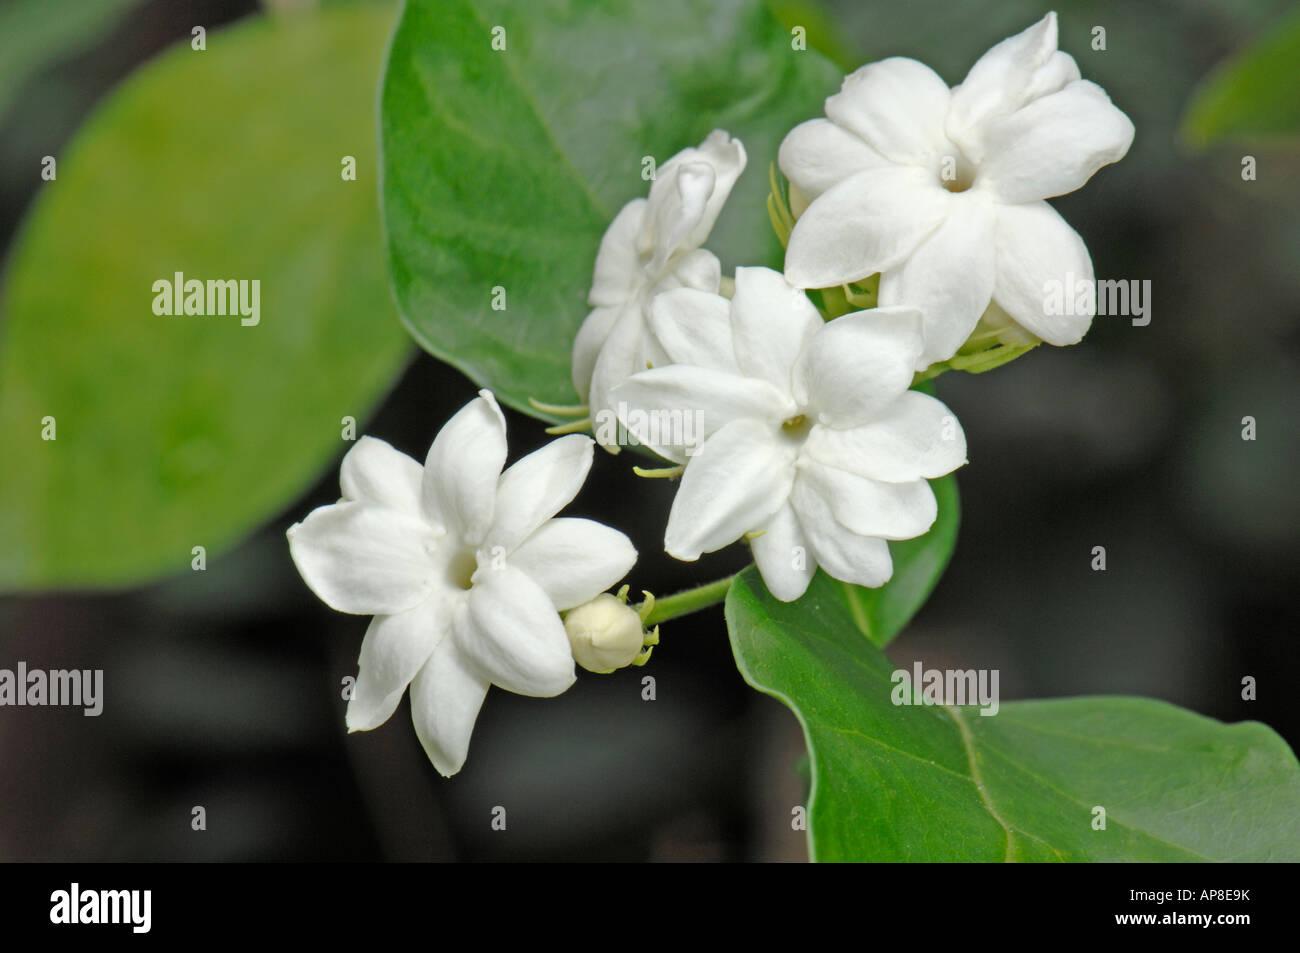 Arabian Jasmine (Jasminum sambac), flowering twig - Stock Image